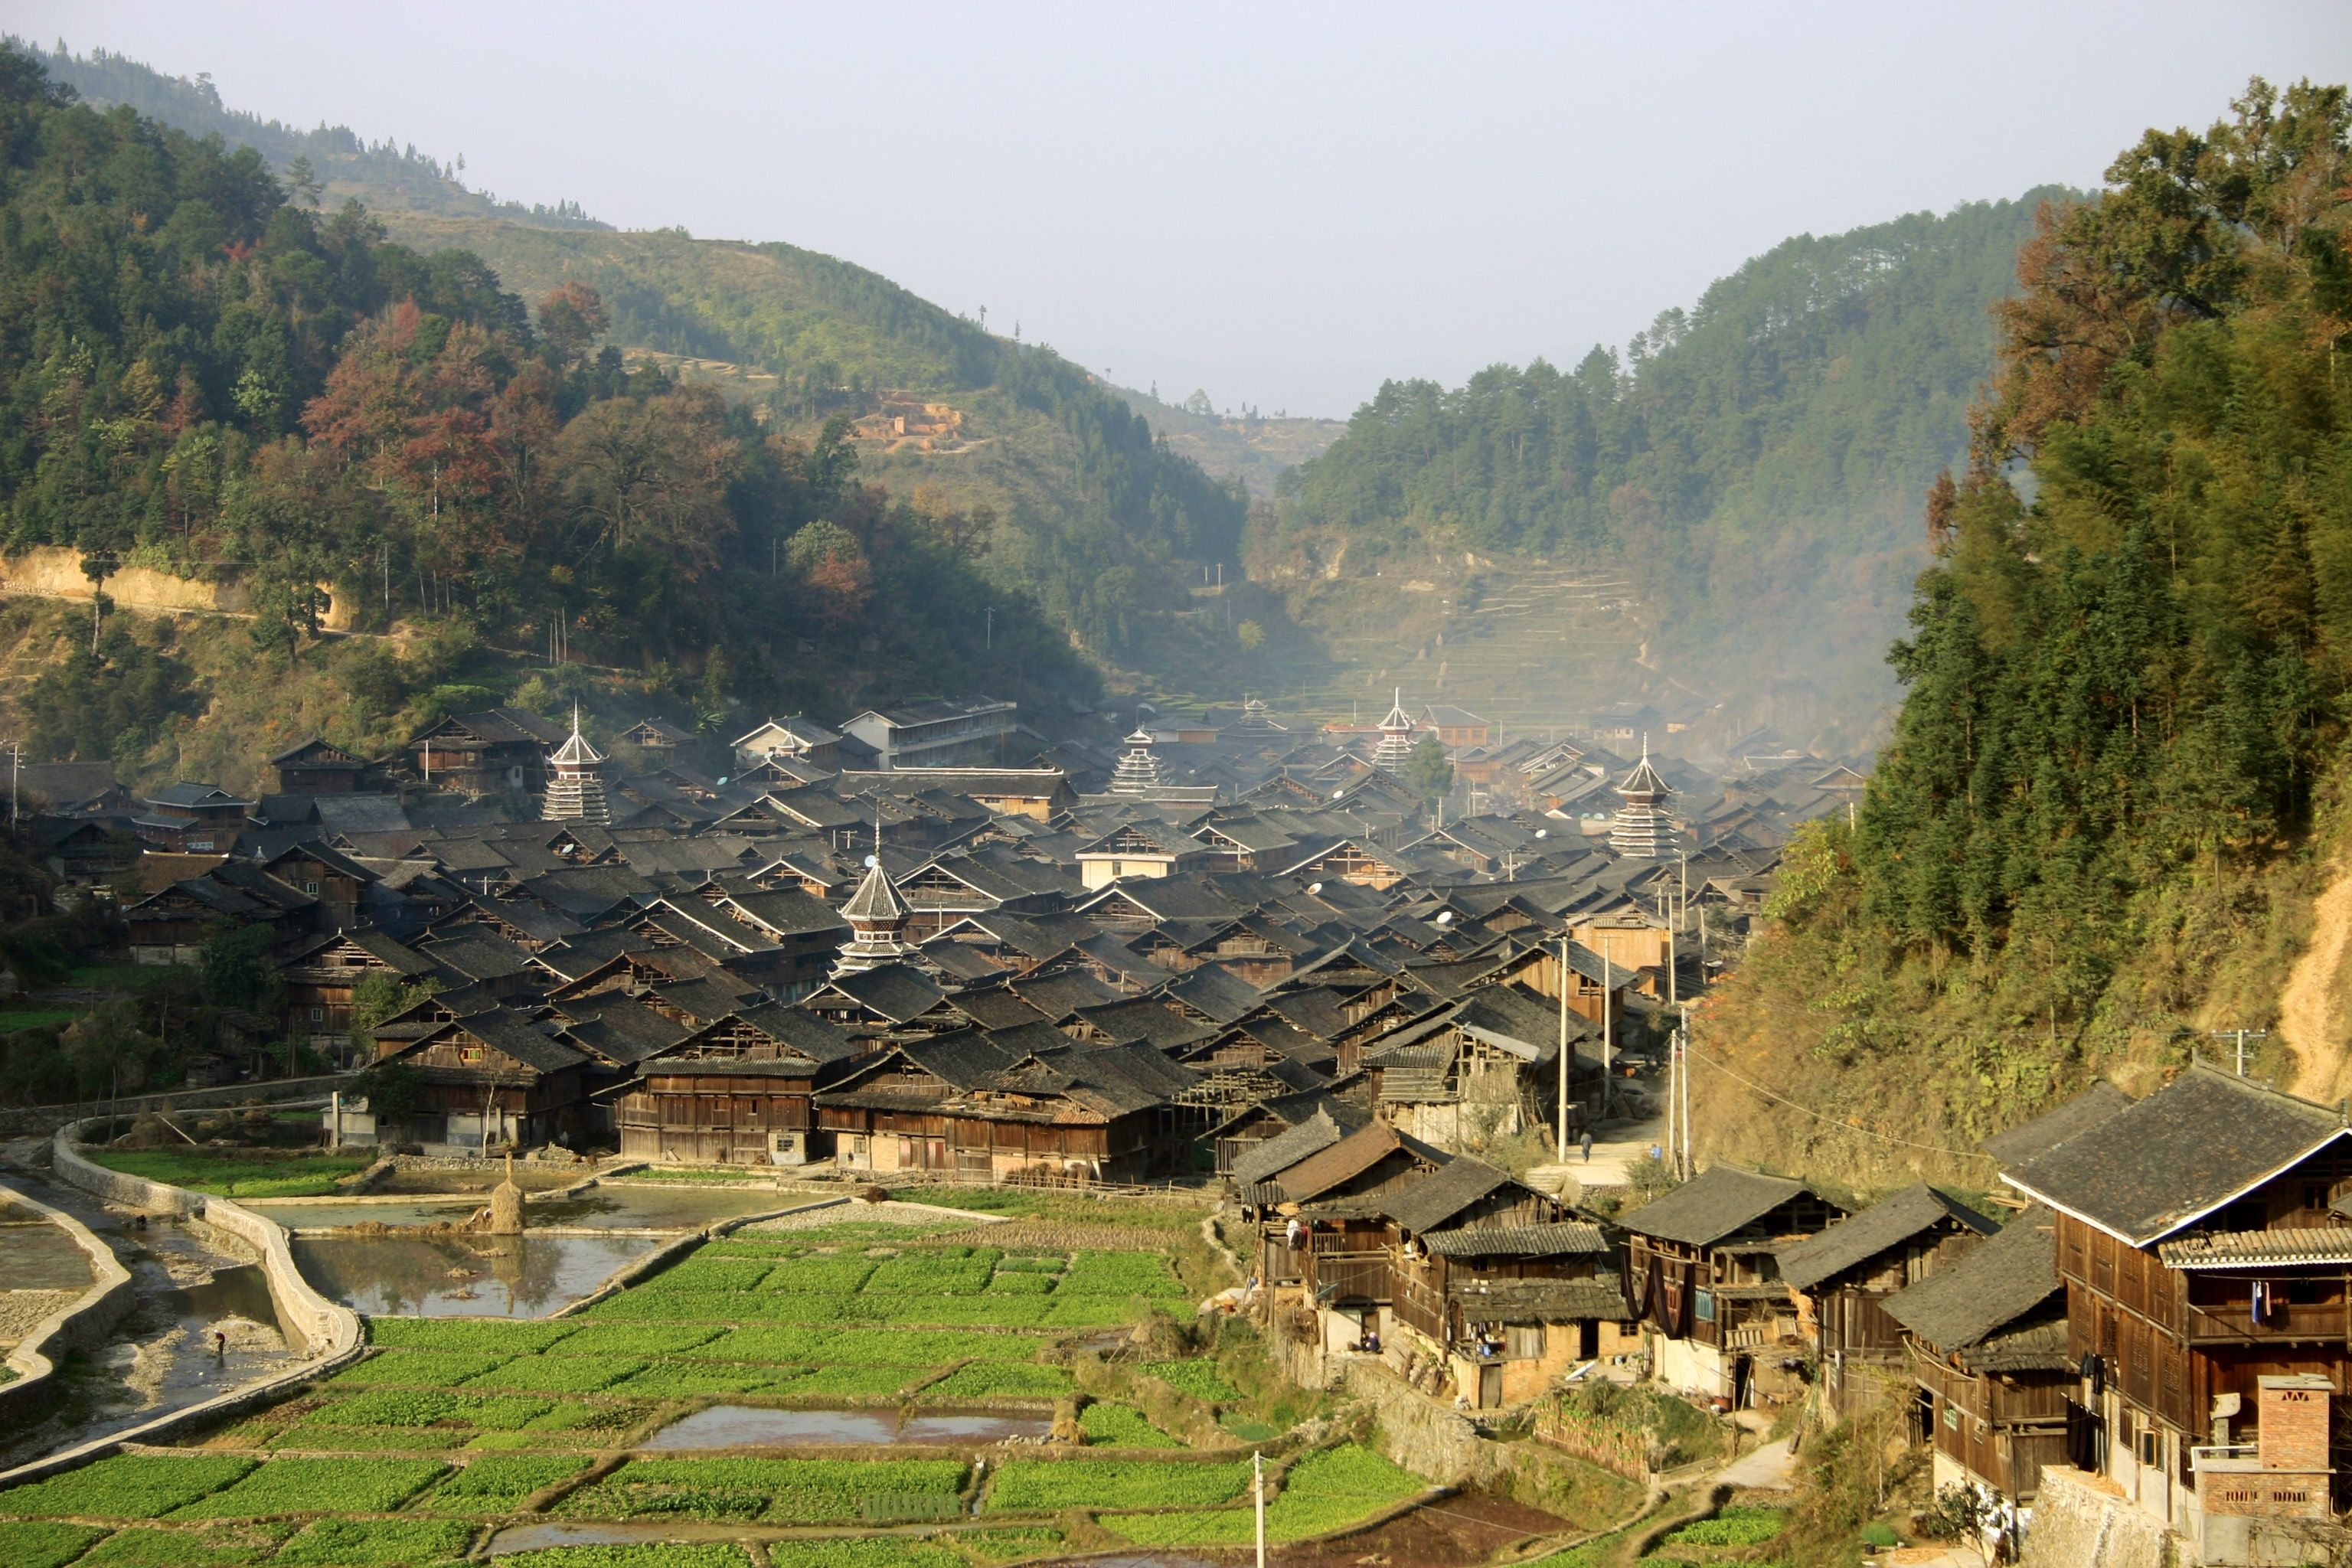 rural china village - Google Search | mountainous building ...